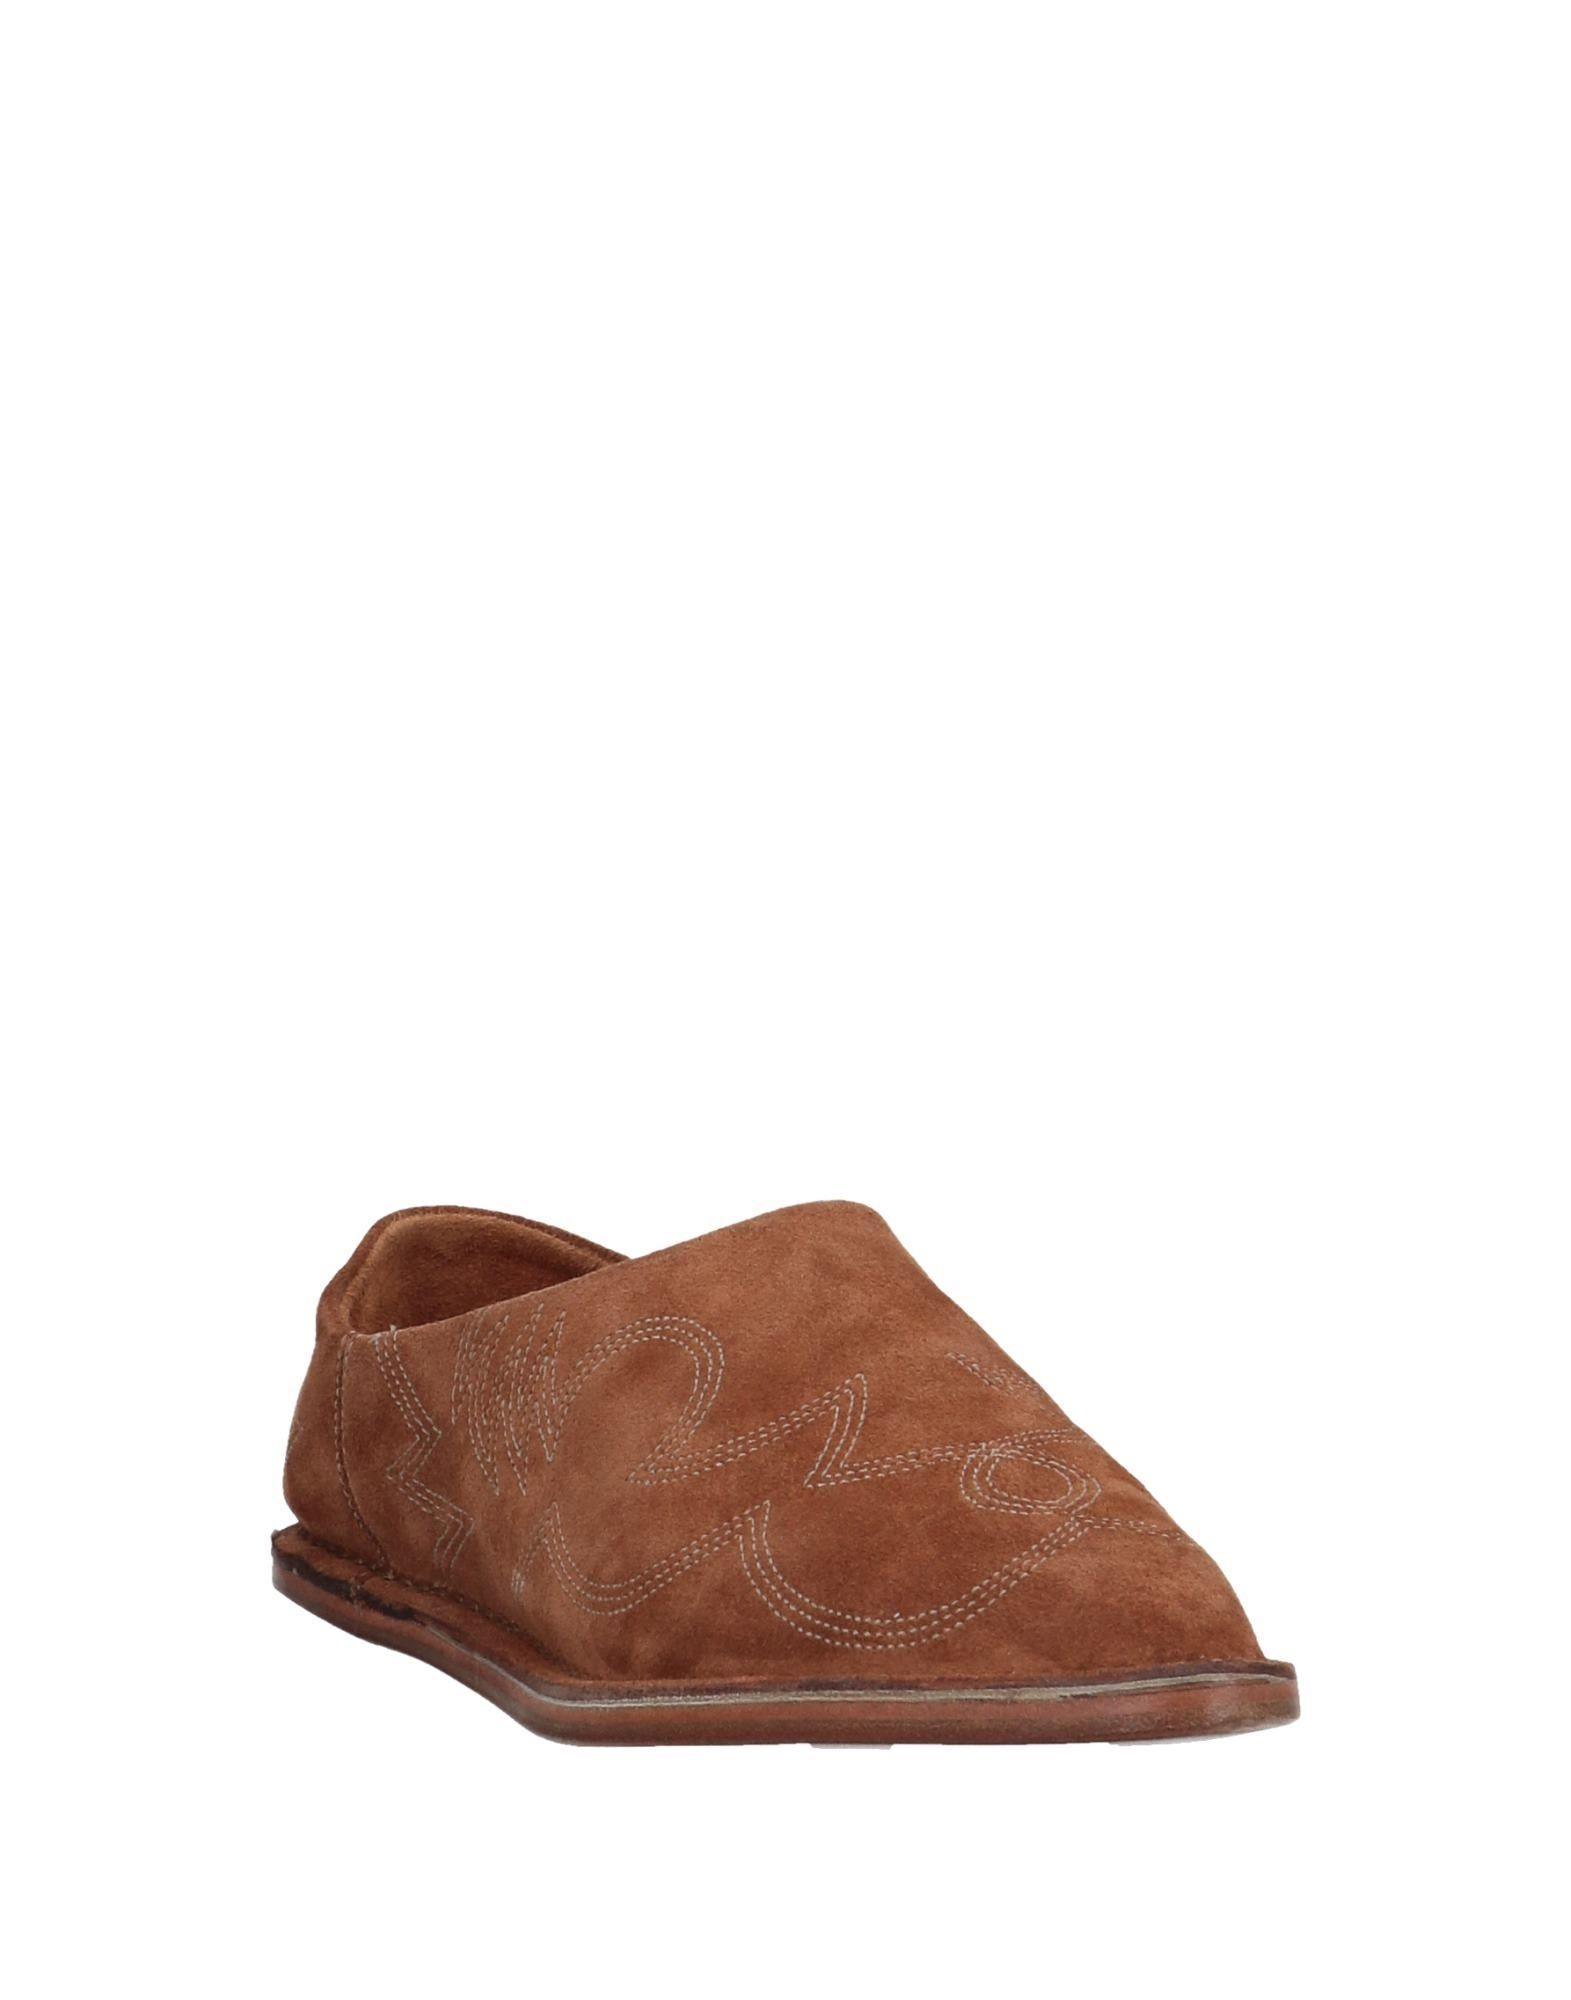 Stilvolle billige Schuhe Damen Buttero® Mokassins Damen Schuhe  11536627SA 07fe08